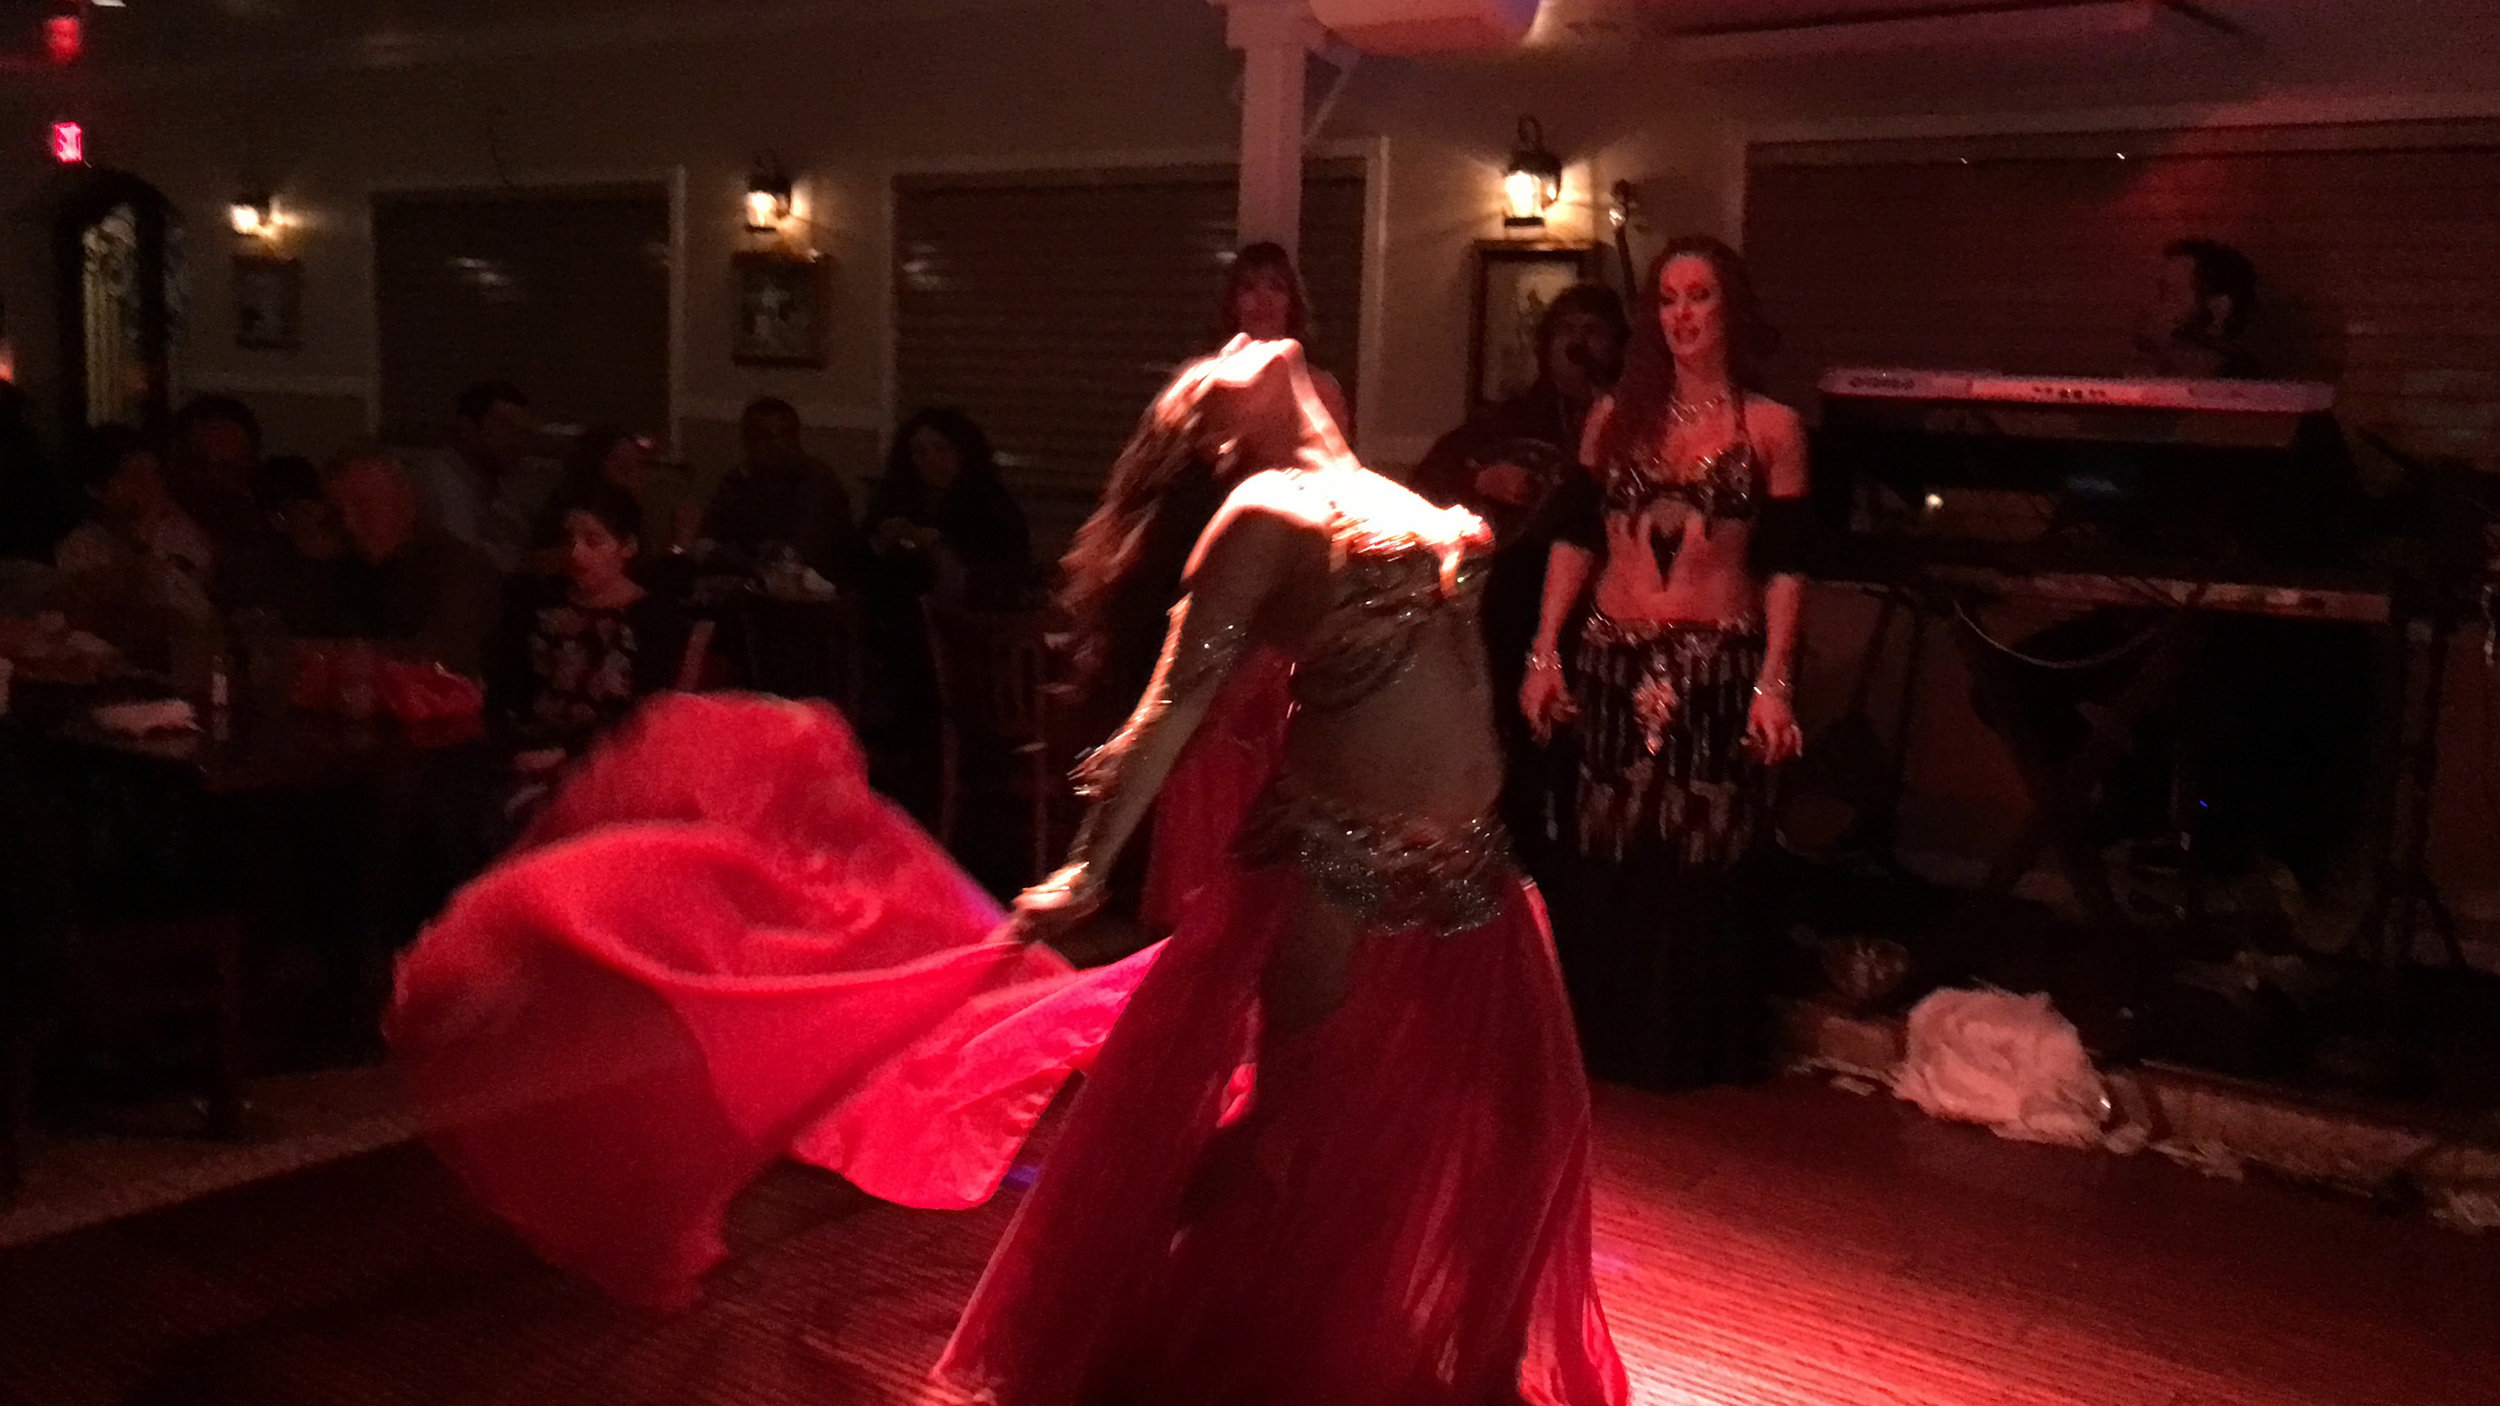 Bellydance with red veil zorbas.jpg